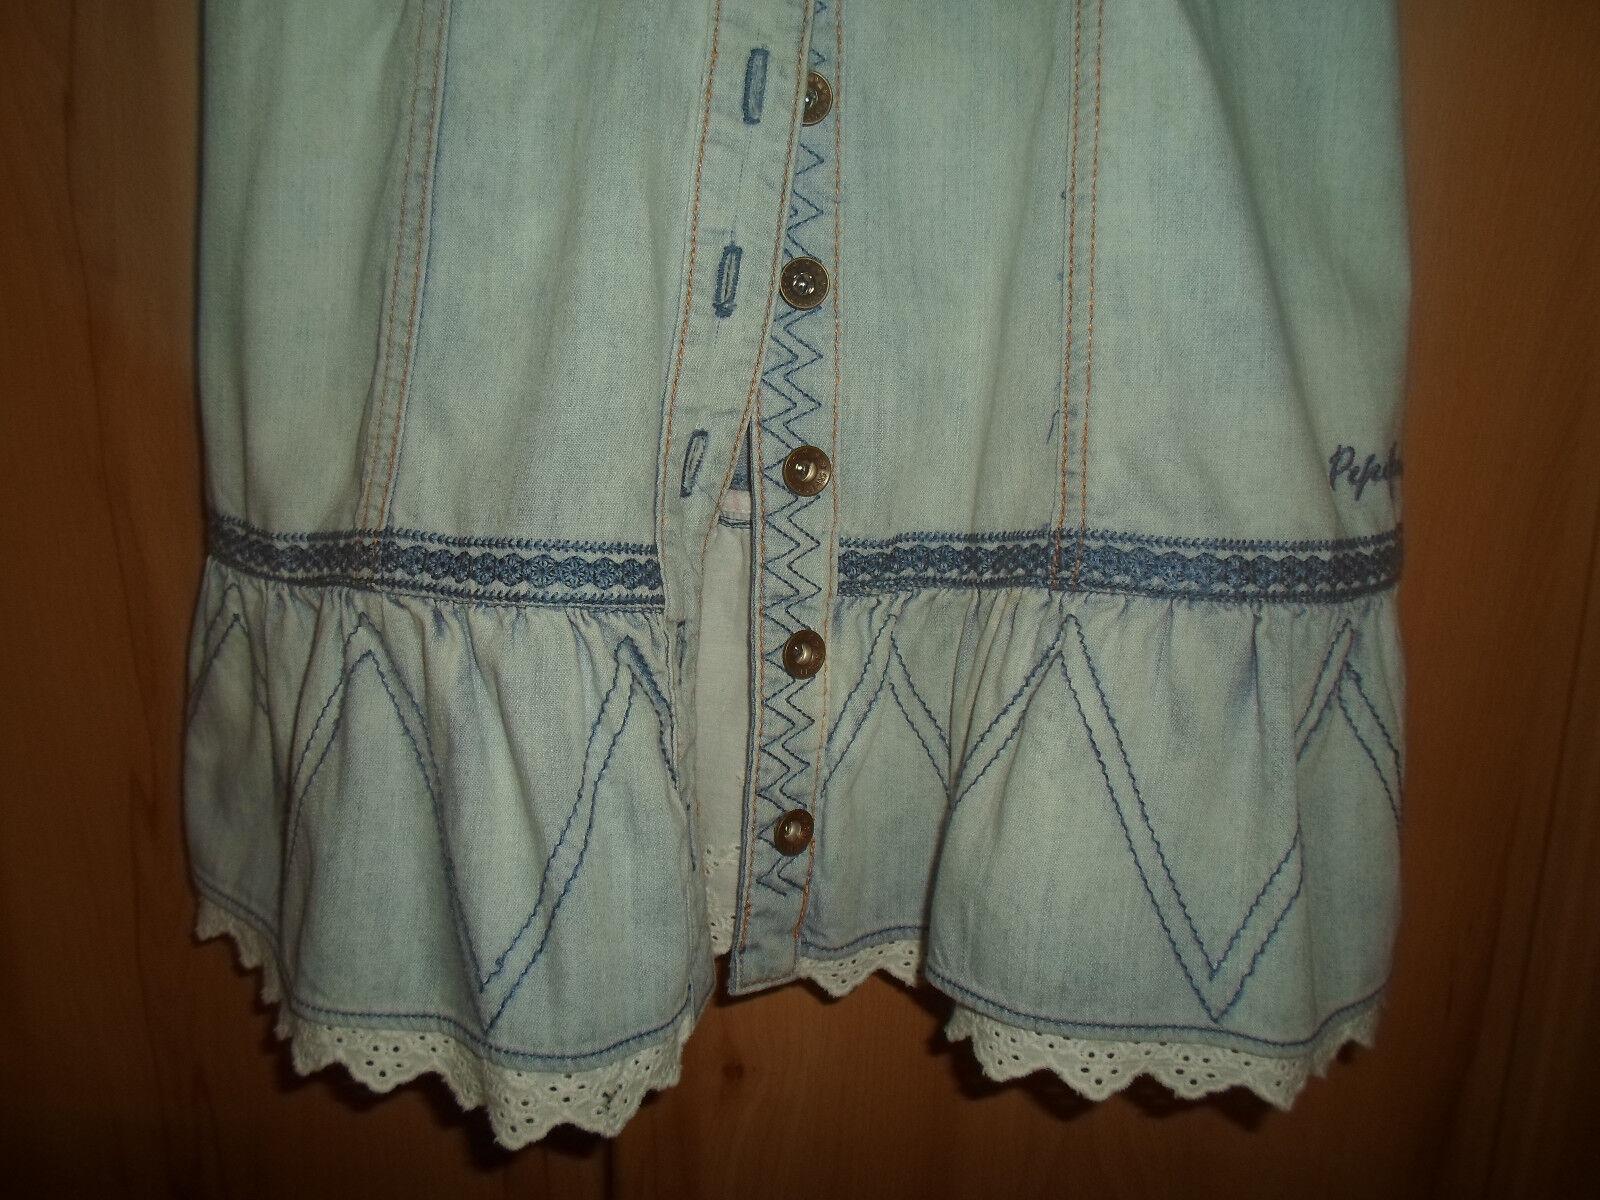 Jeanskleid Jeanskleid Jeanskleid von Pepe Jeans Gr. 34 Blau 8ed826